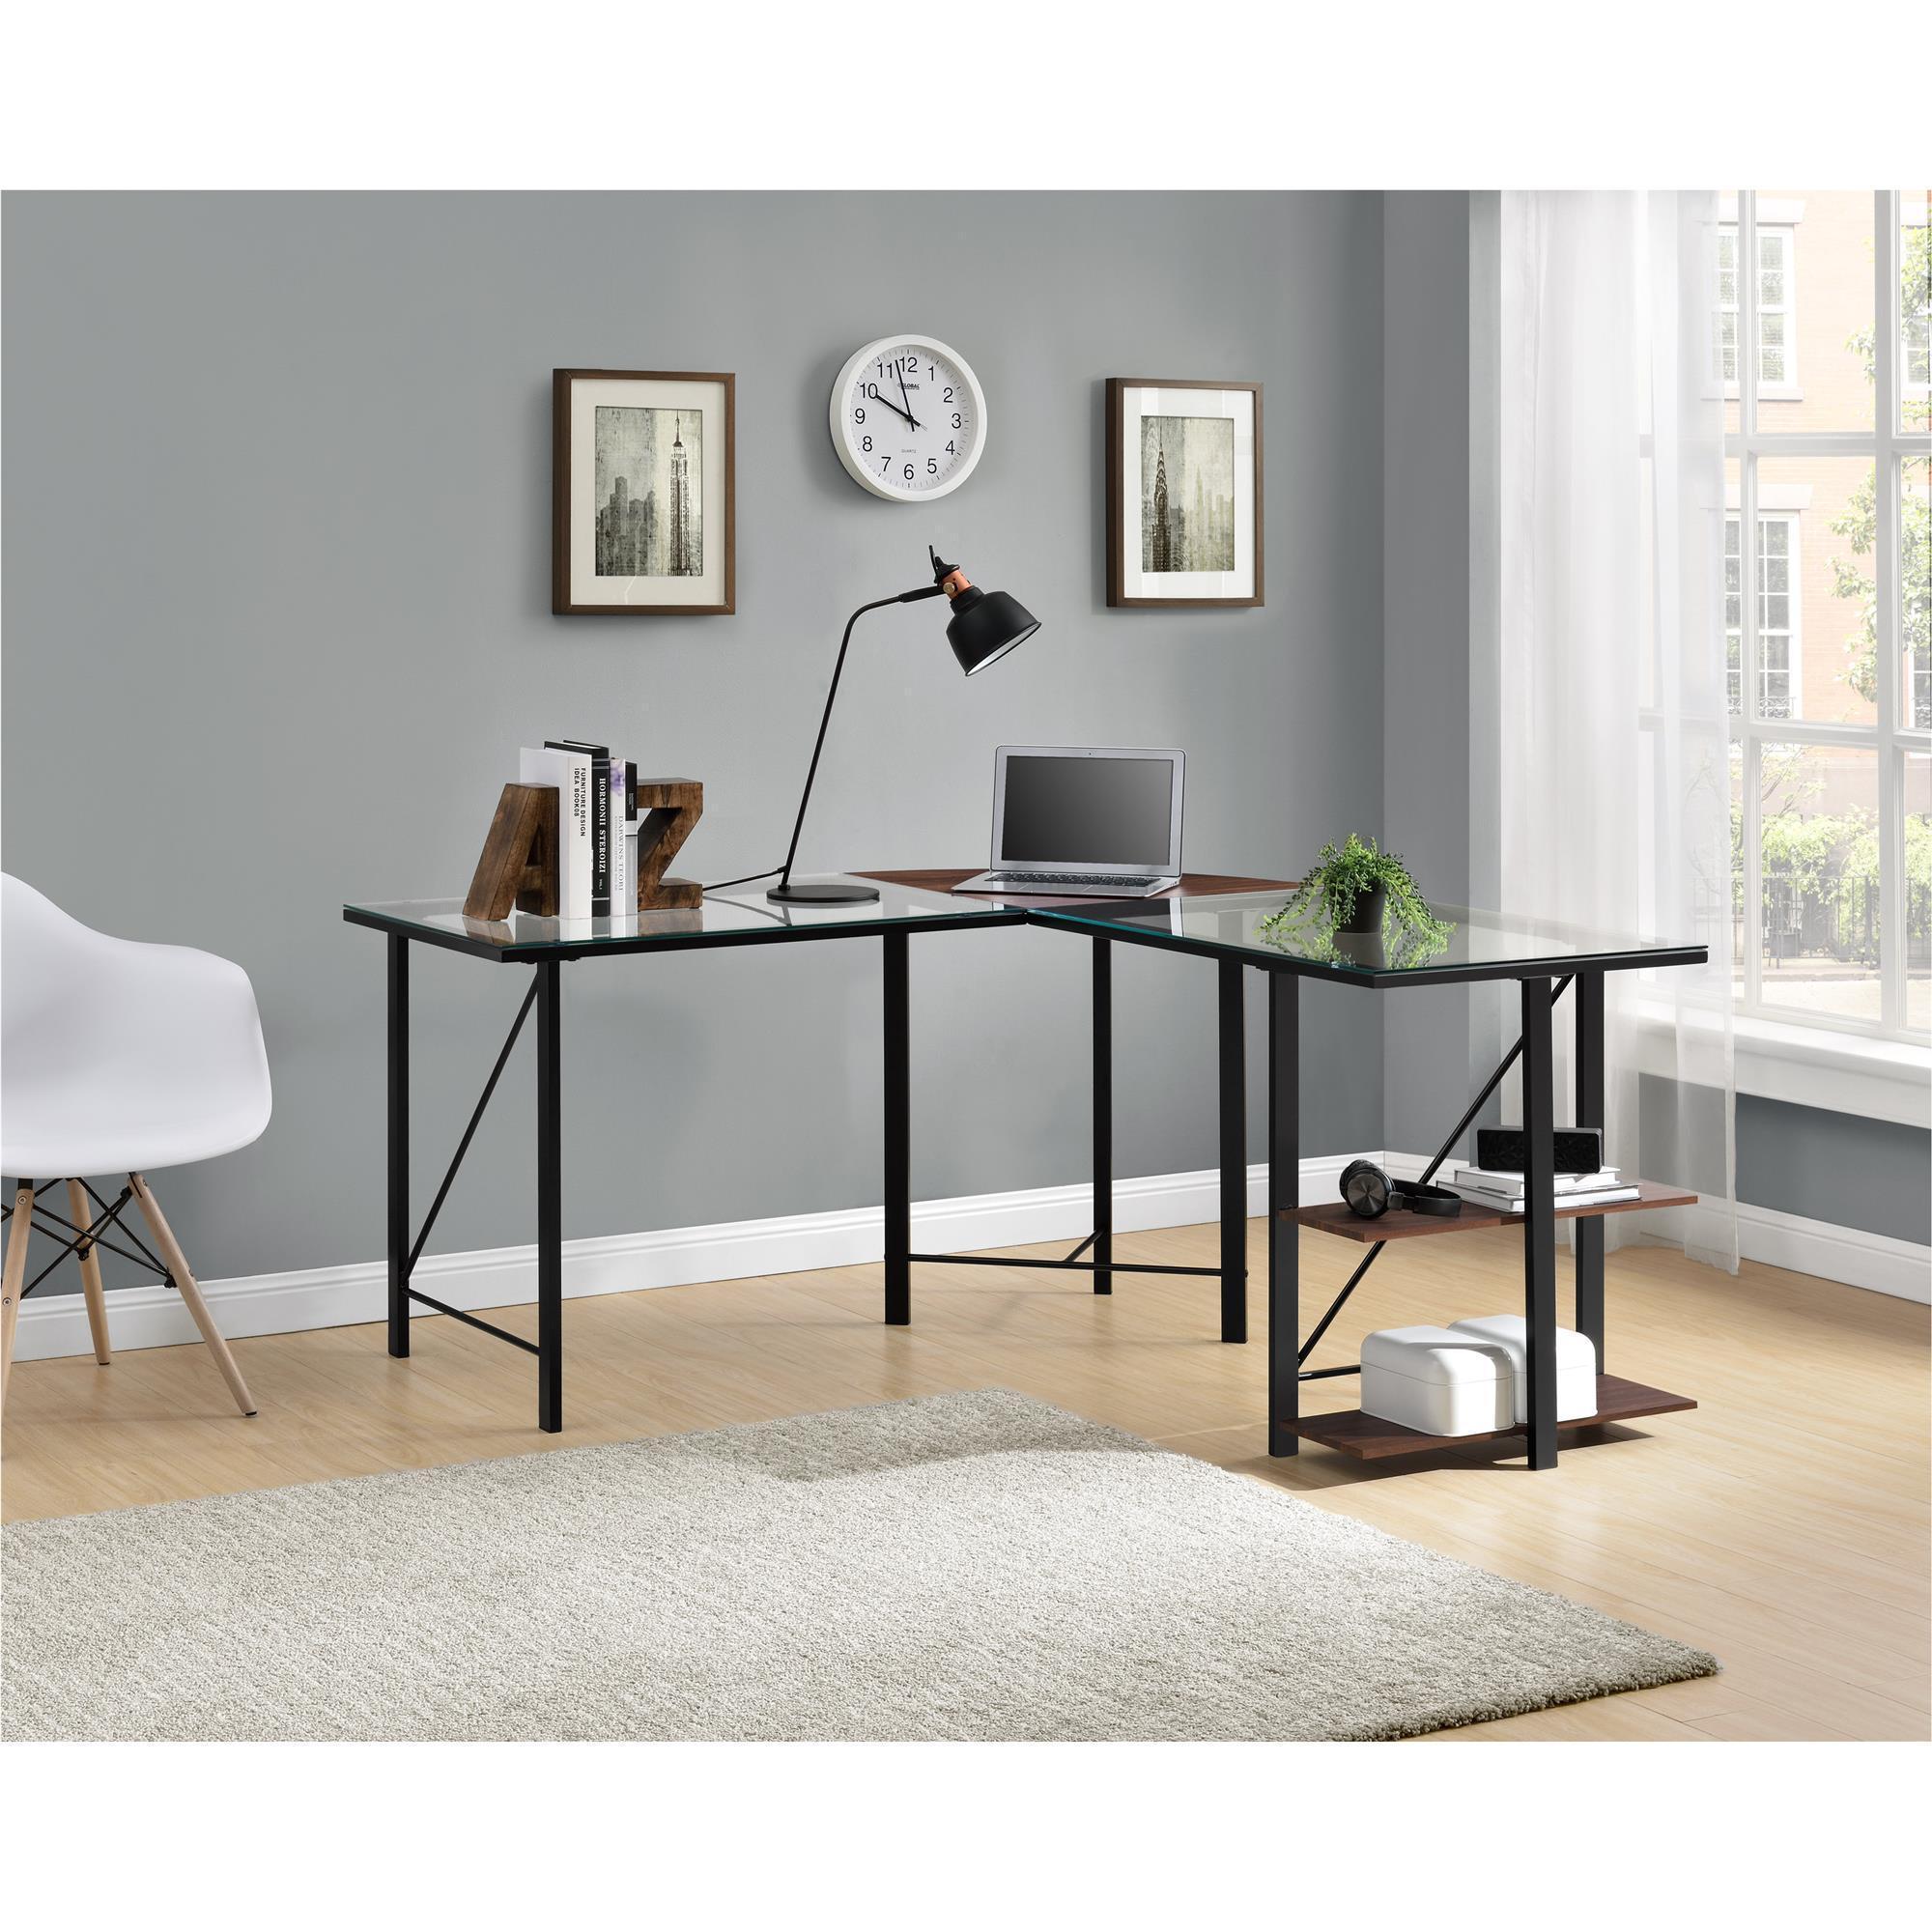 in target facts l ameriwood computer shaped desk about black espresso